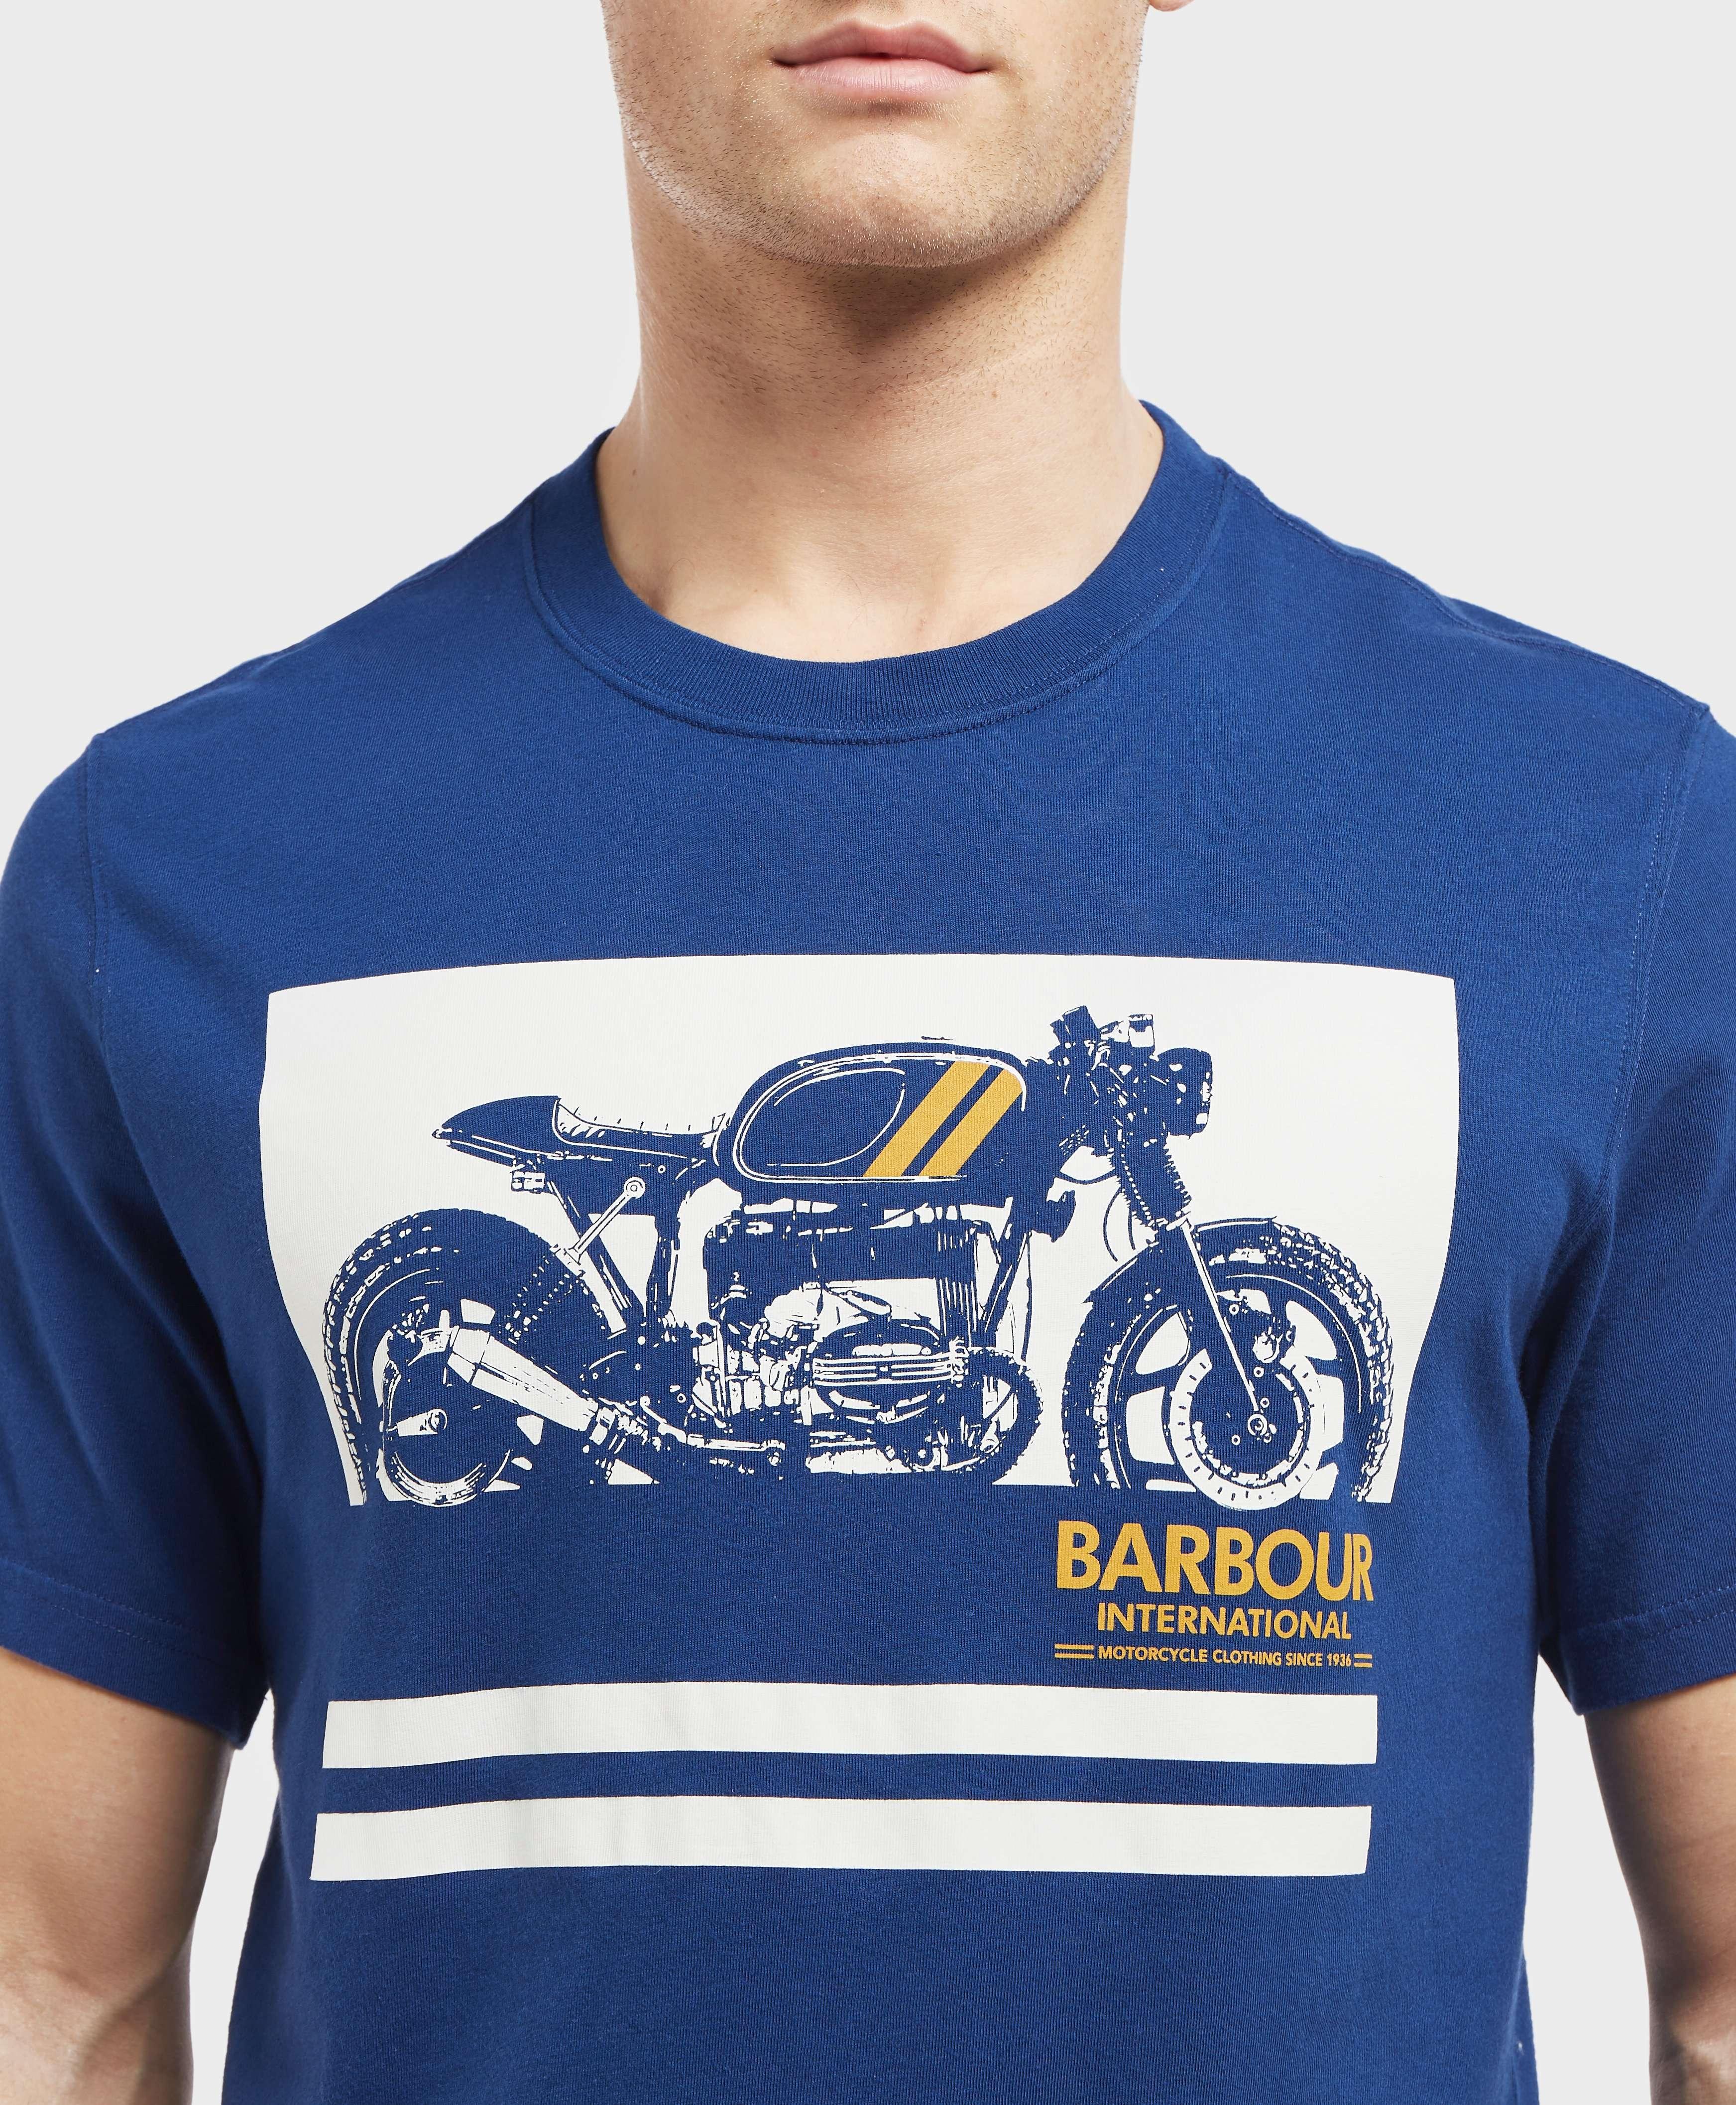 Barbour International Regulator Short Sleeve T-Shirt